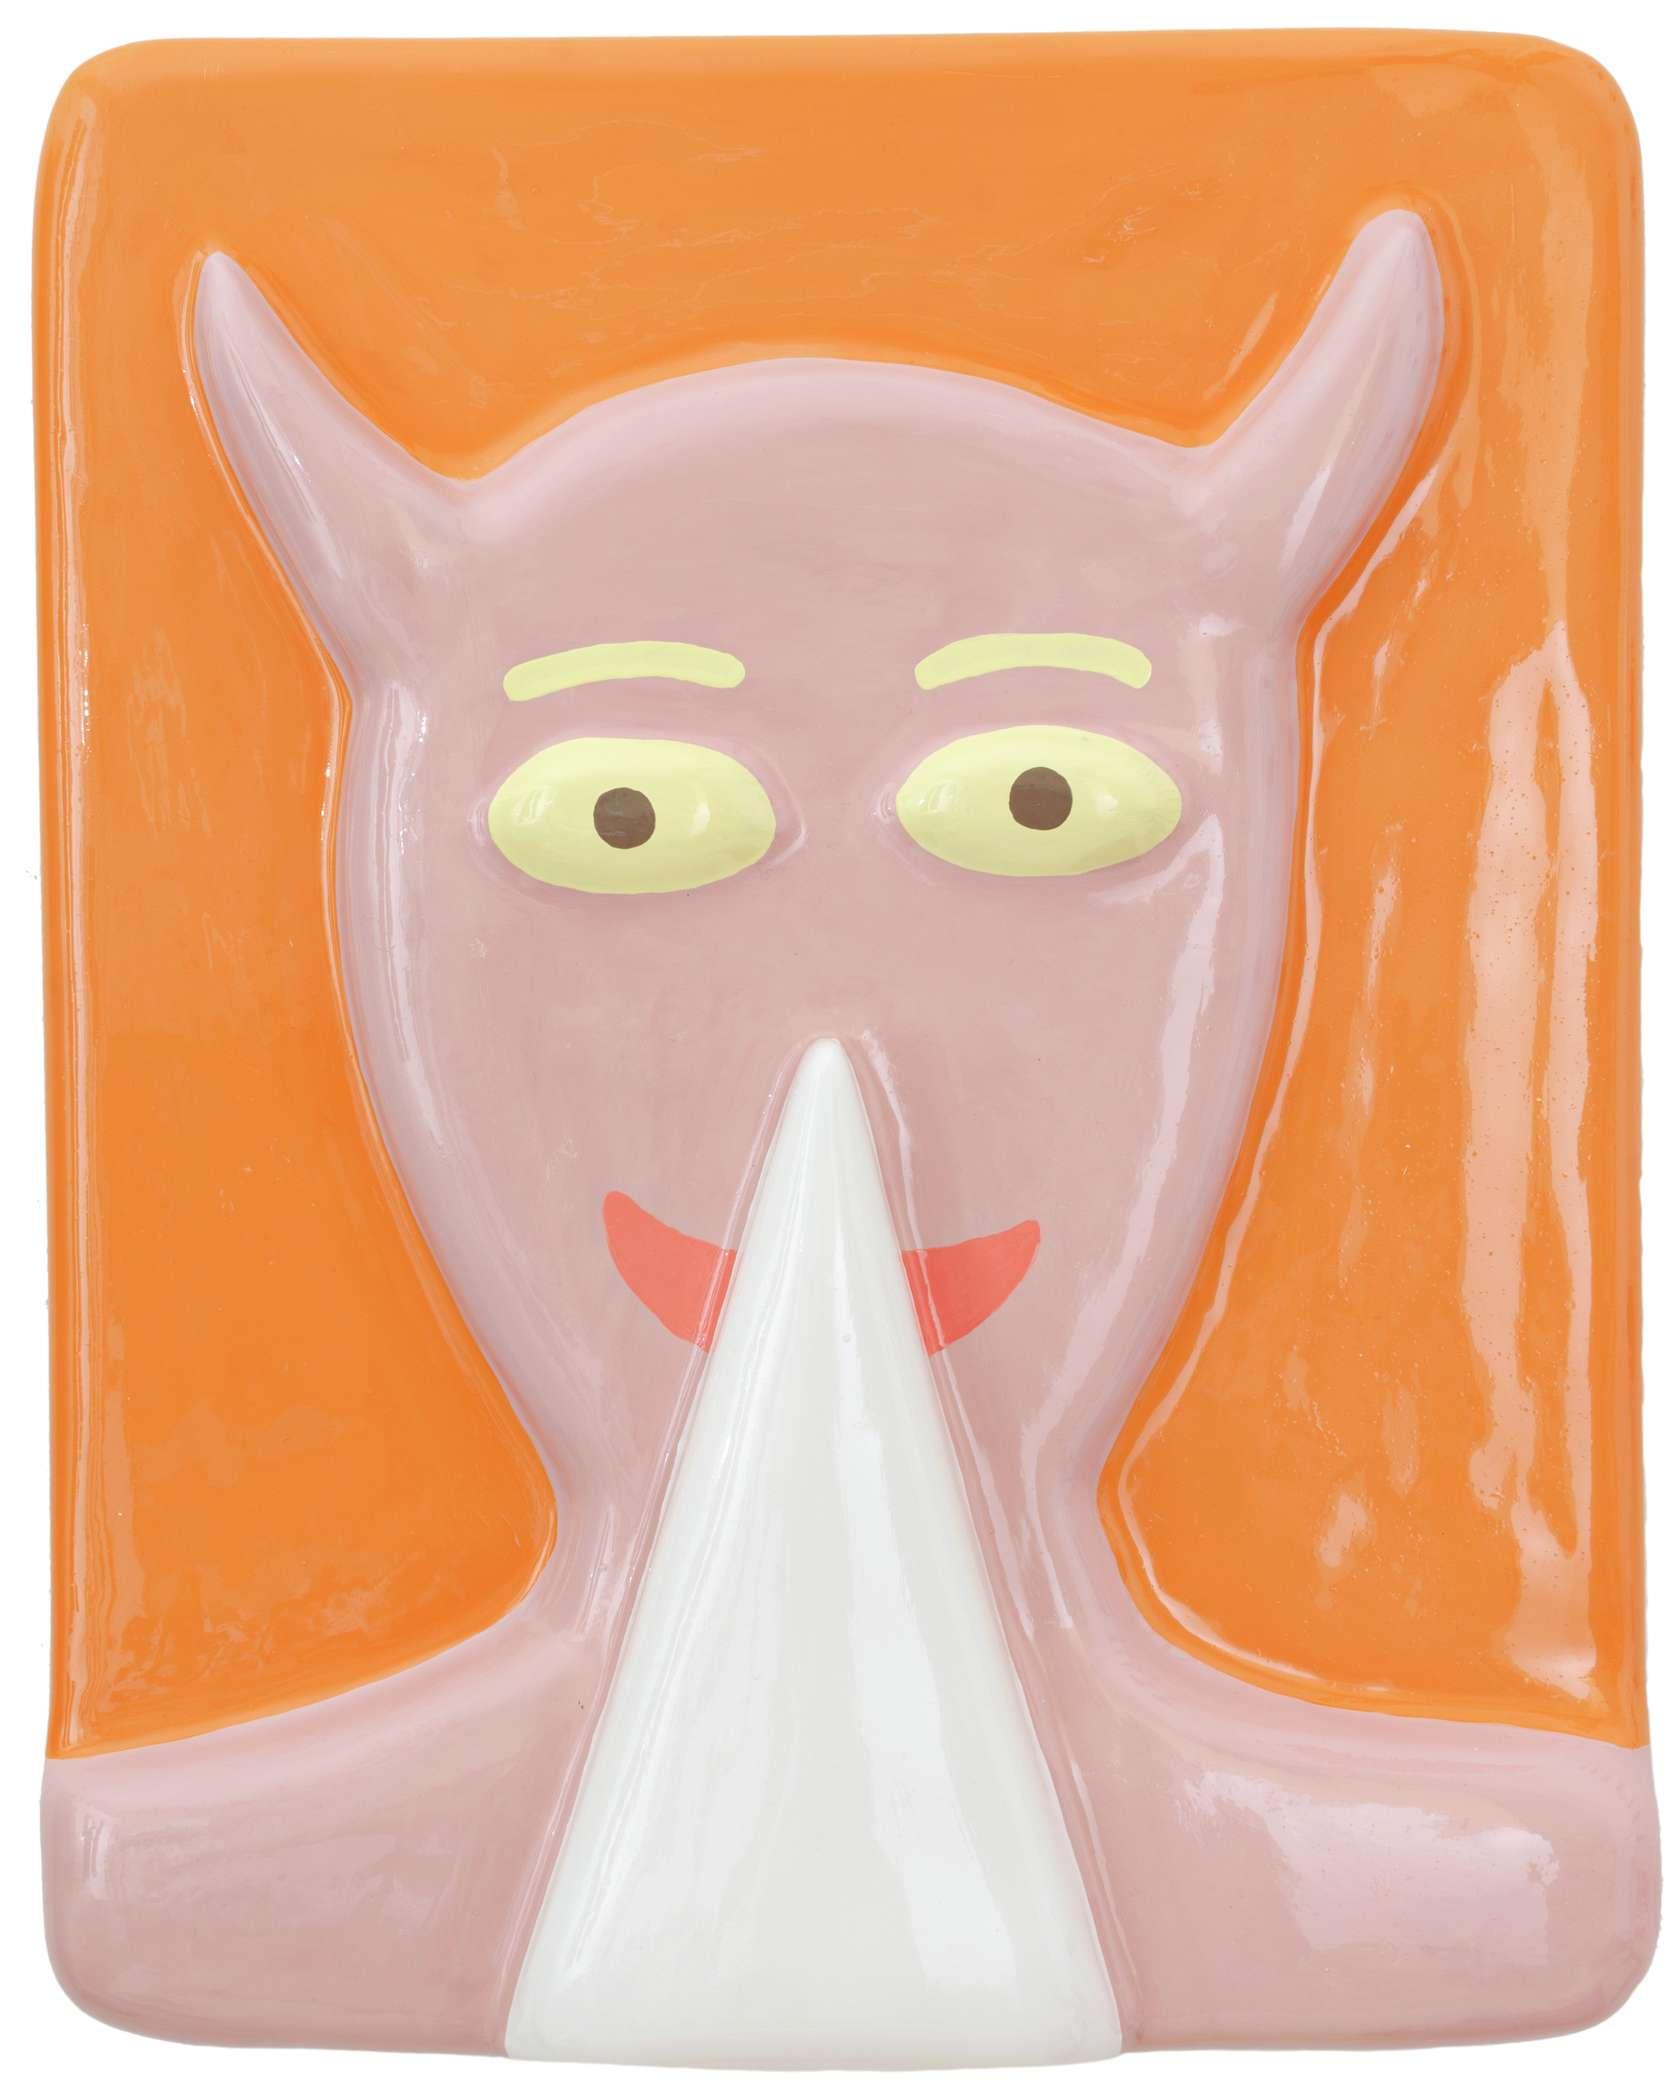 Louis Gary, He, 2019 Polystyrène, bois, plâtre, peinture50 × 40 × 8 cm / 19 5/8 × 15 3/4 × 3 1/8 in.